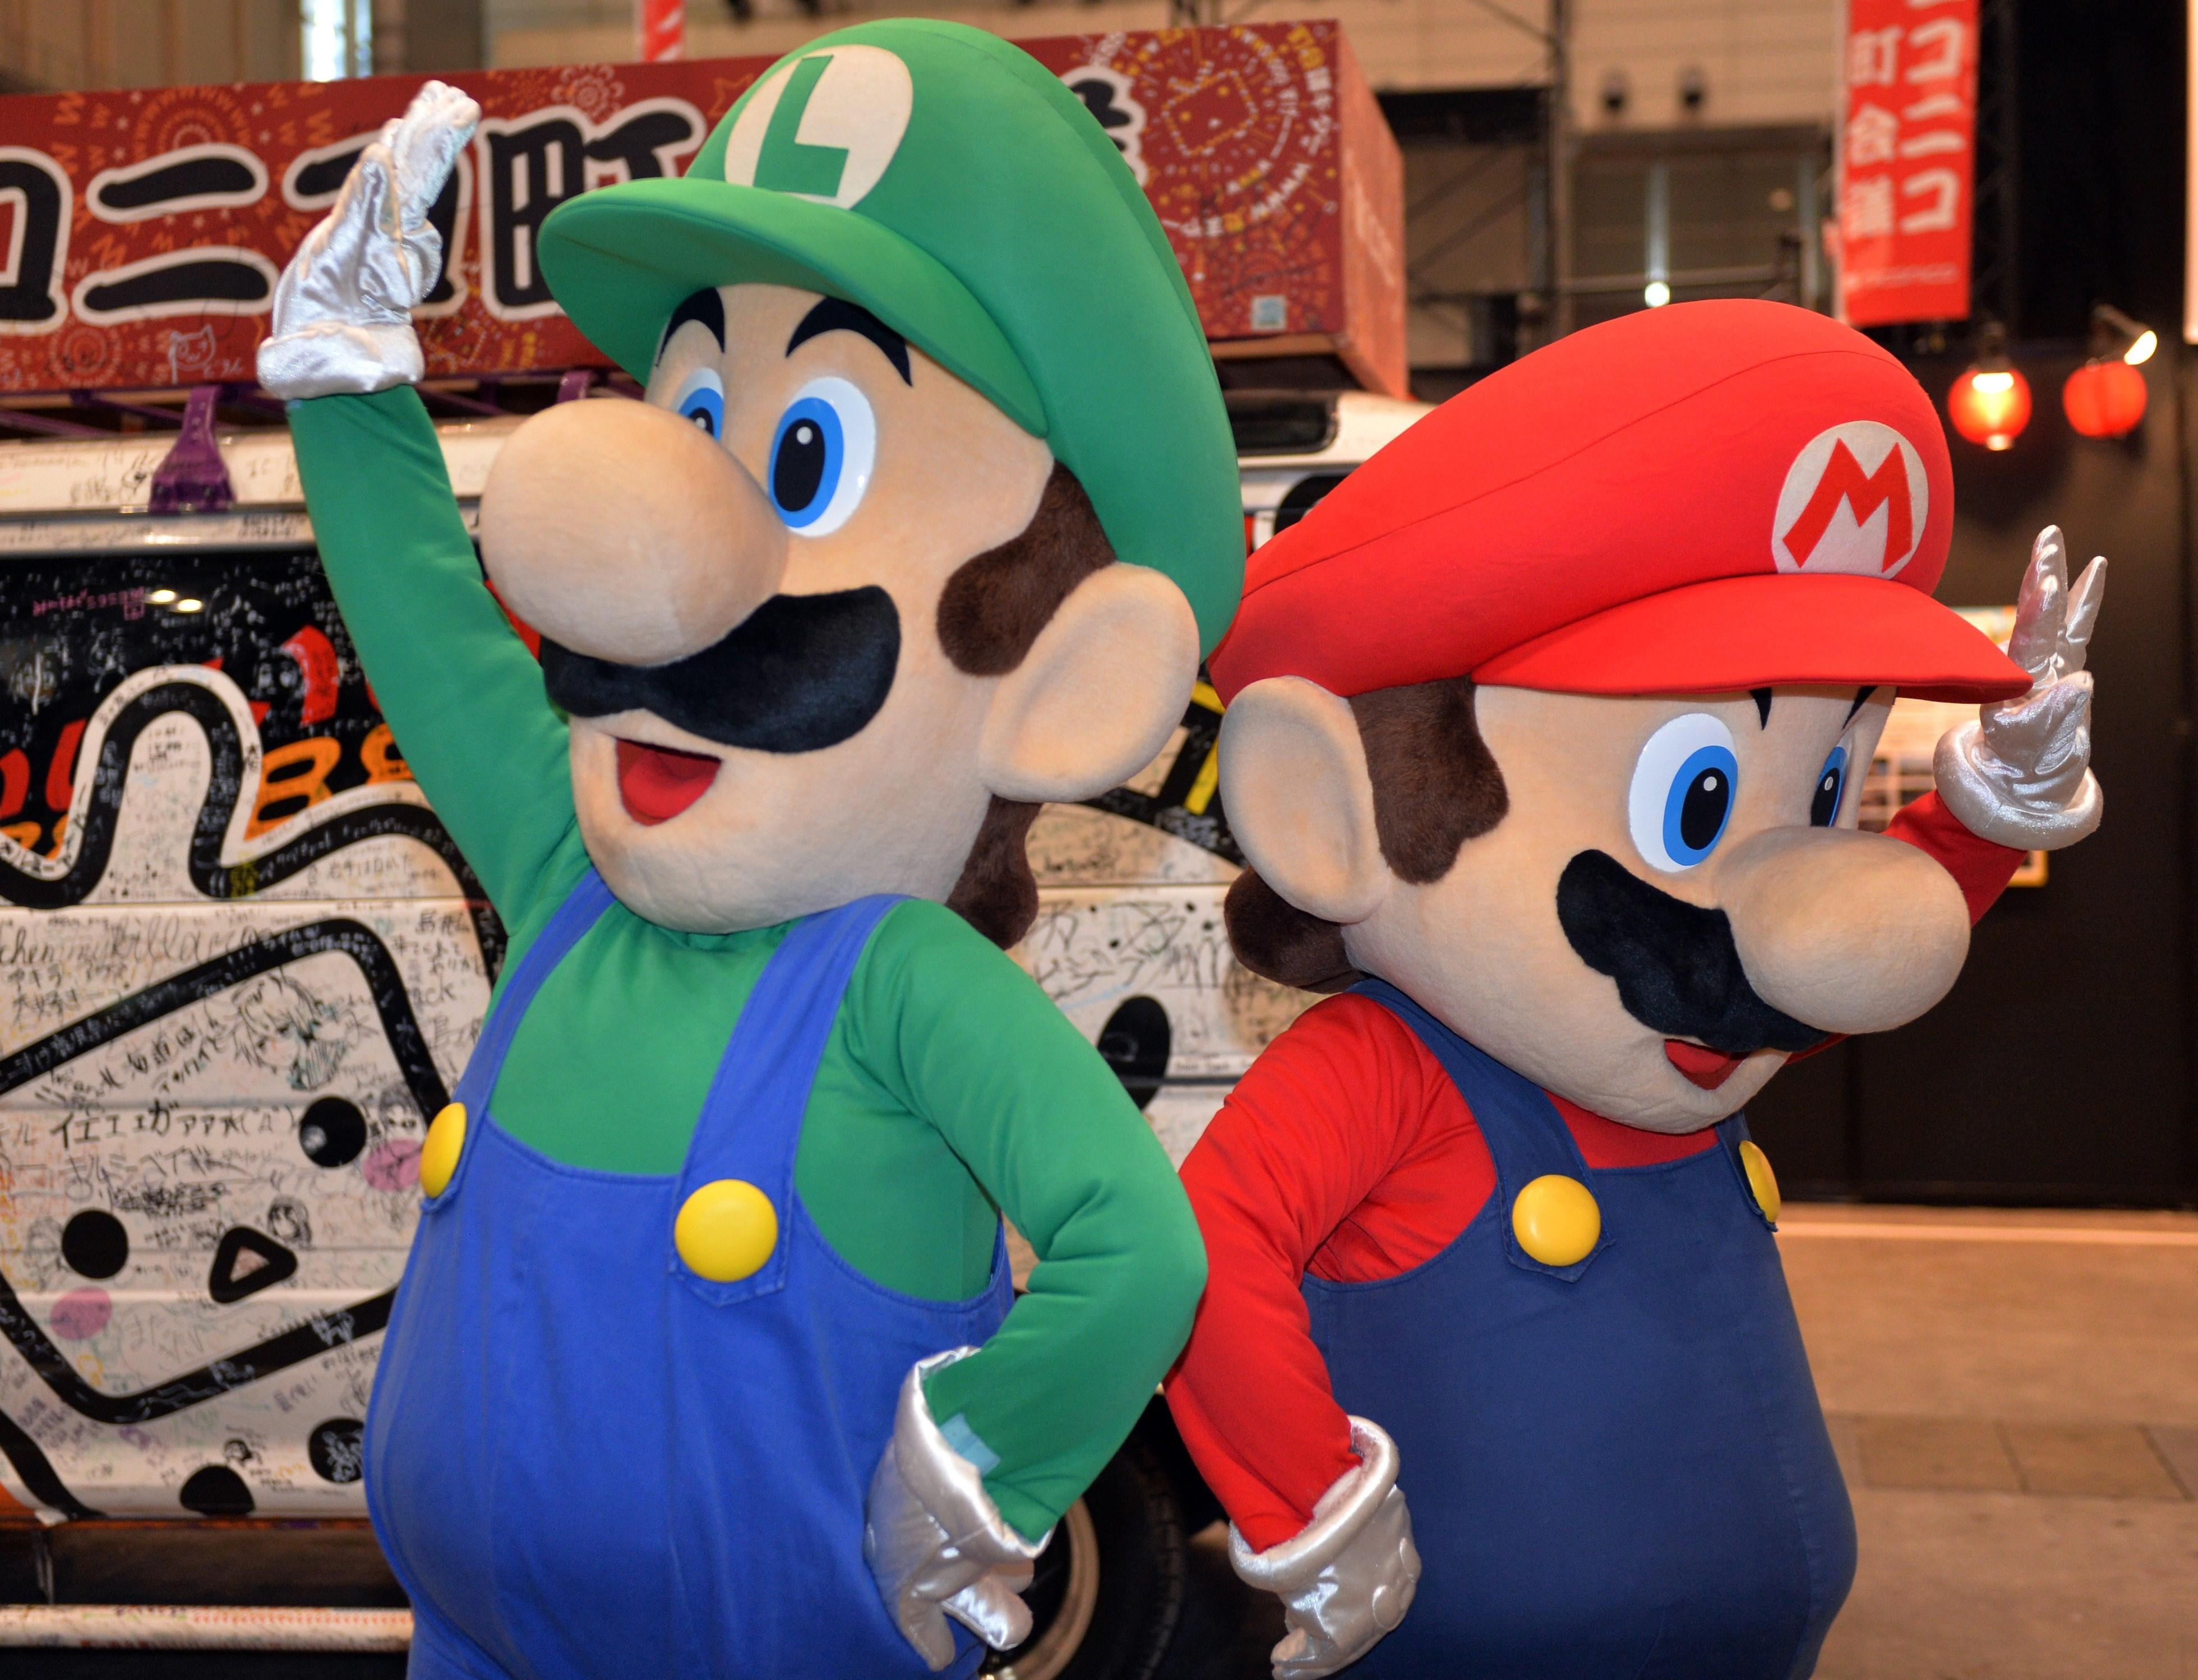 Nintendo S Luigi Appears To Be Killed In Broadcast Fans